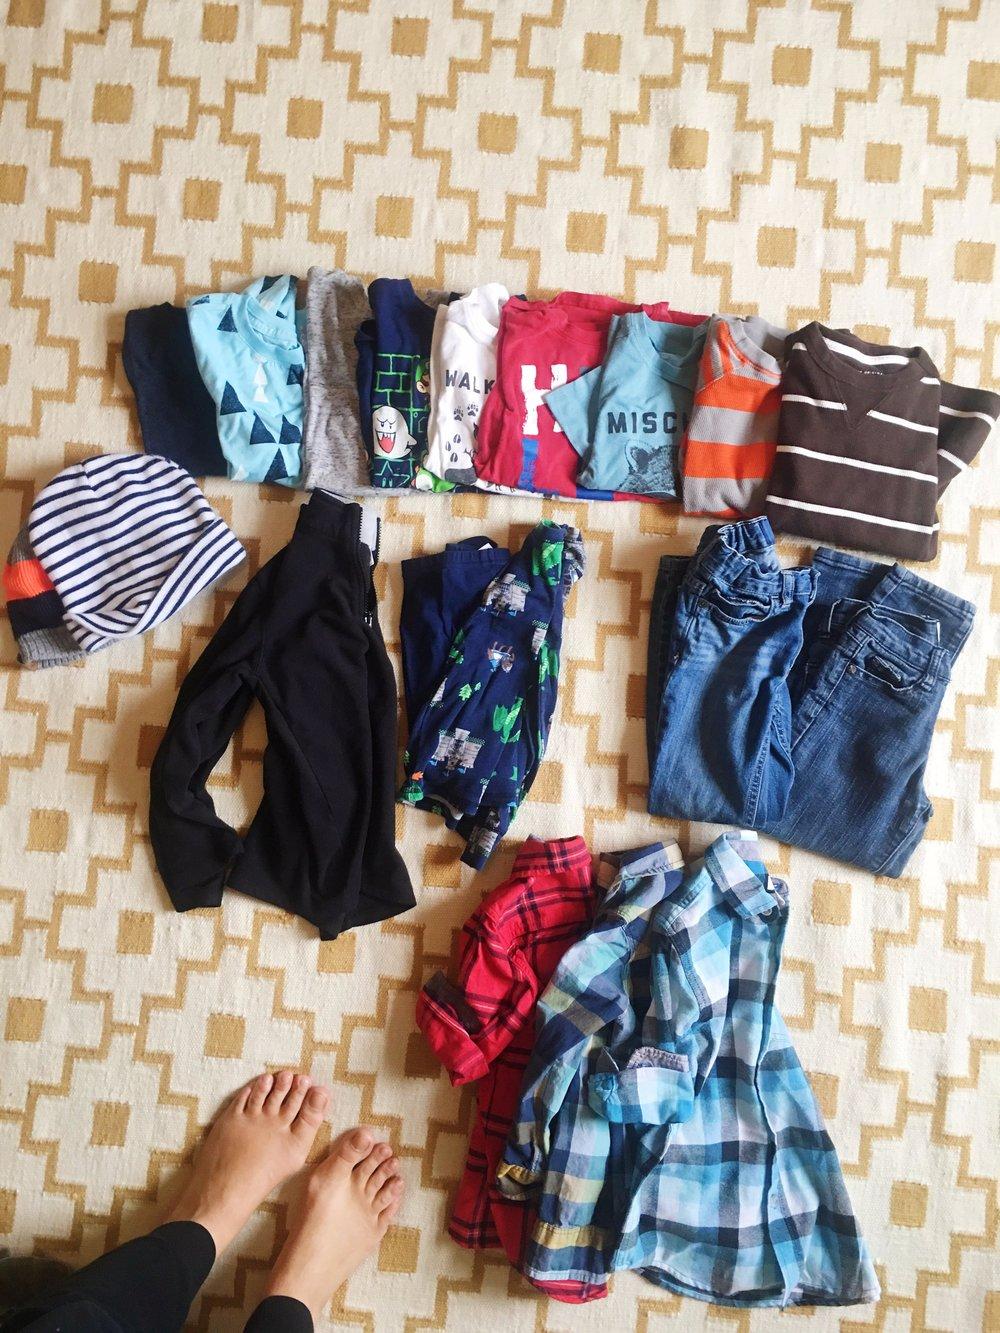 My 6-year-old's wardrobe